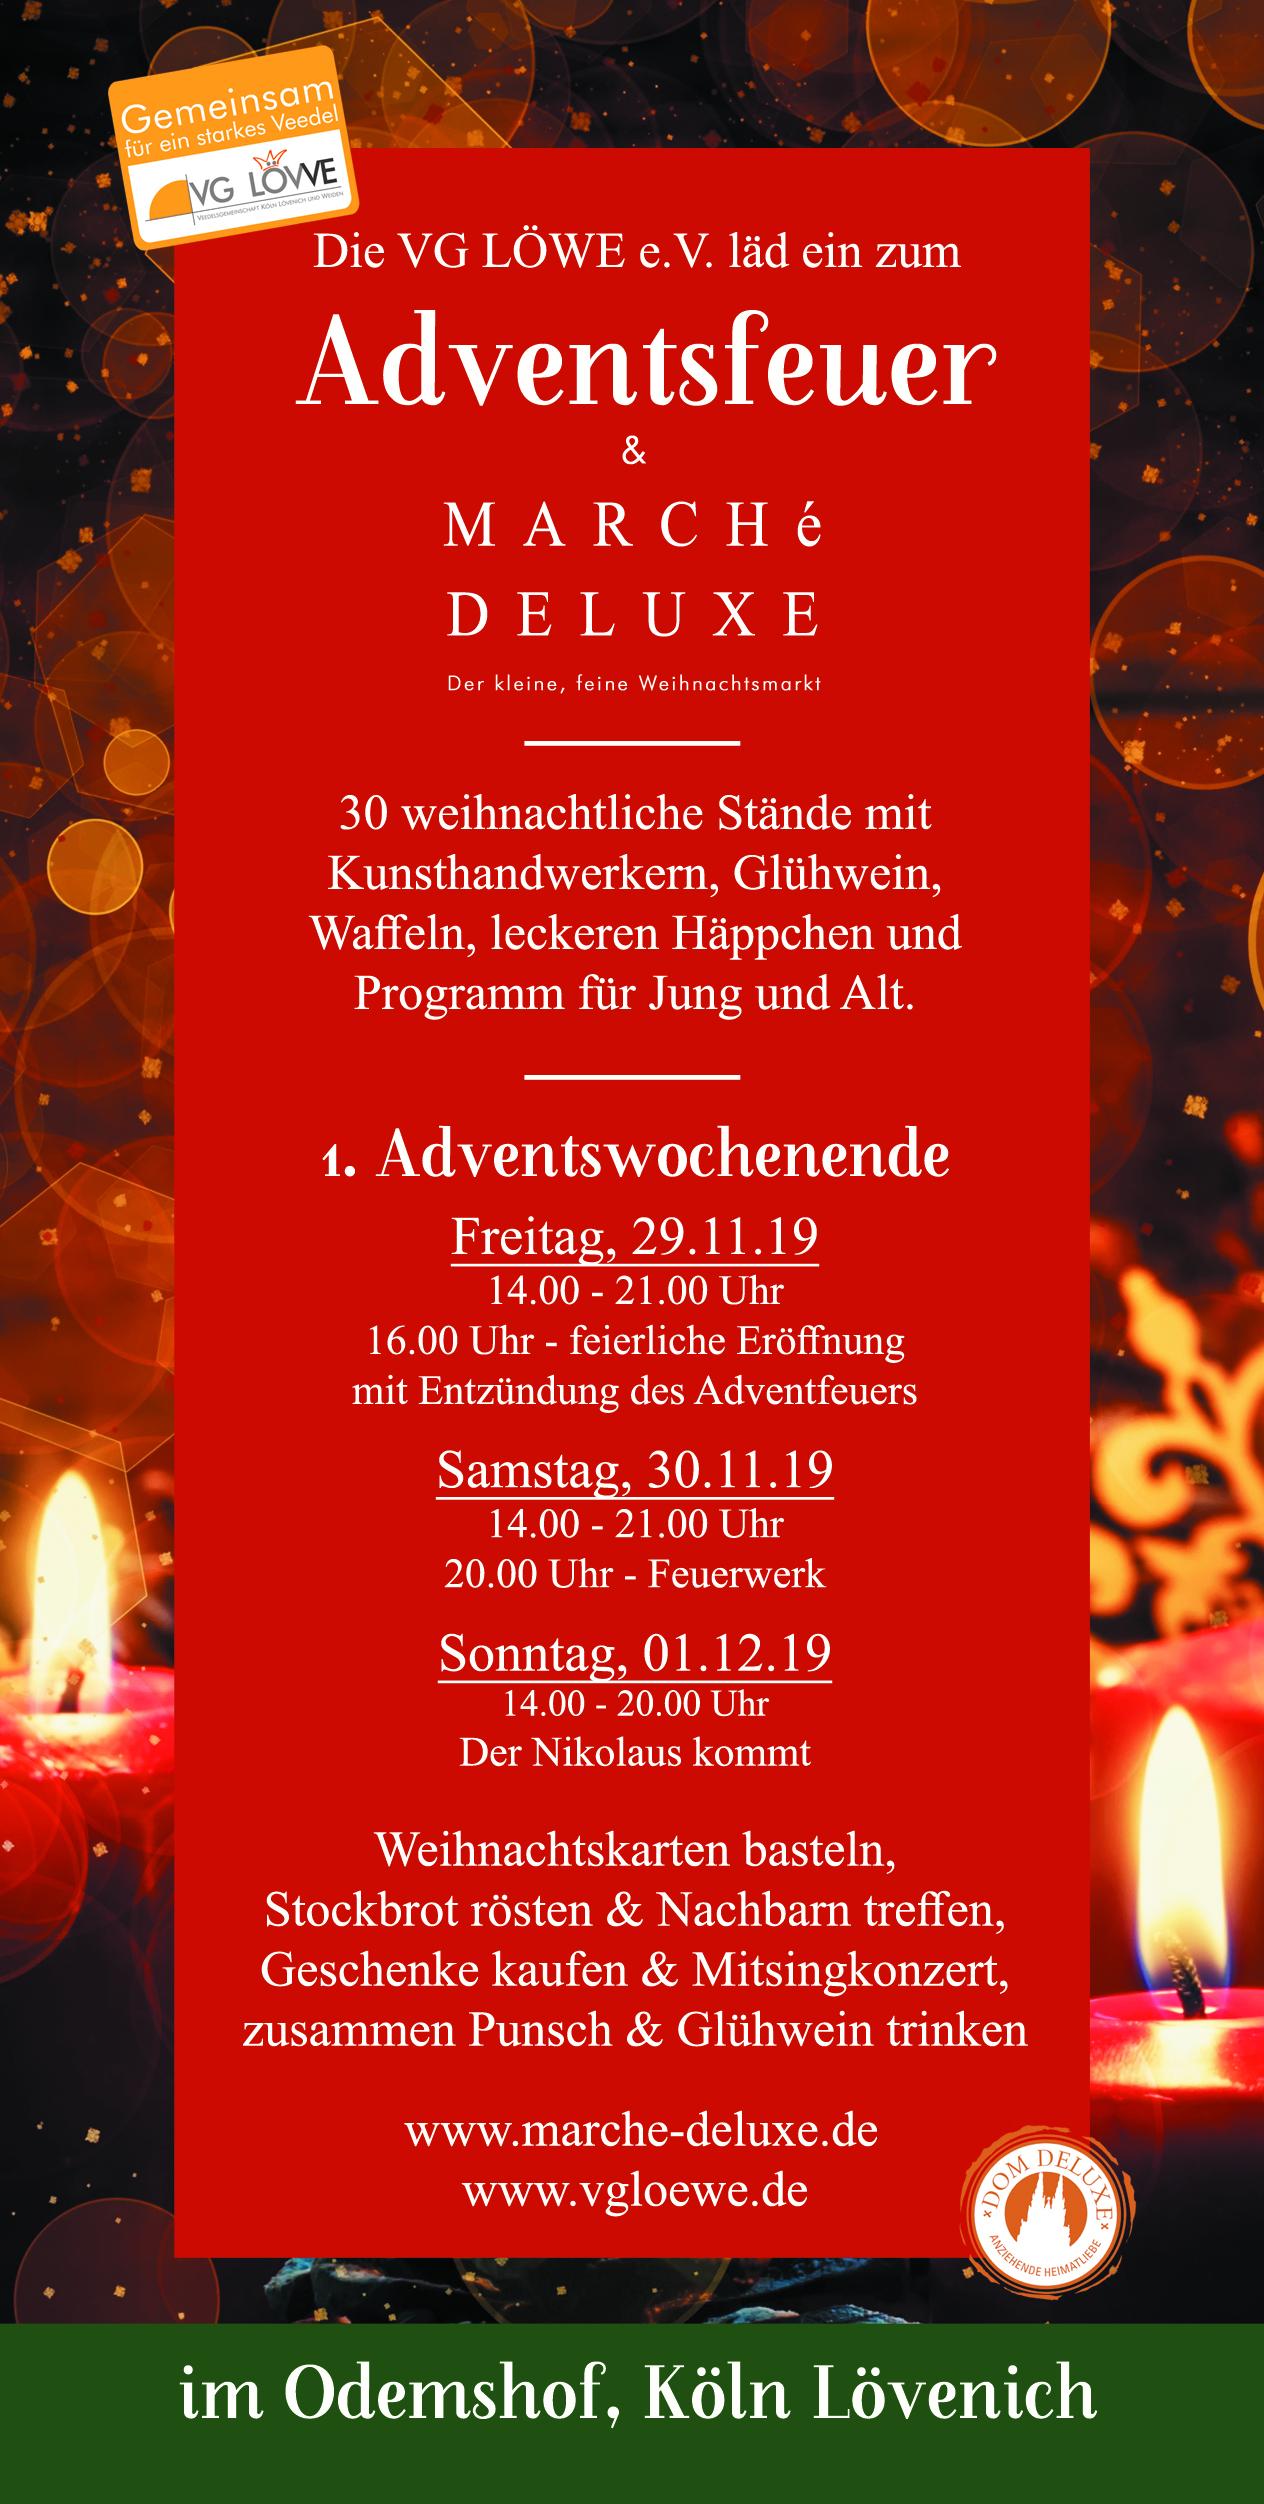 Marché Deluxe Weihnachtsmarkt köln, Weihnachtsmarkt Marché Deluxe & Adventsfeuer 2019, City-News.de, City-News.de